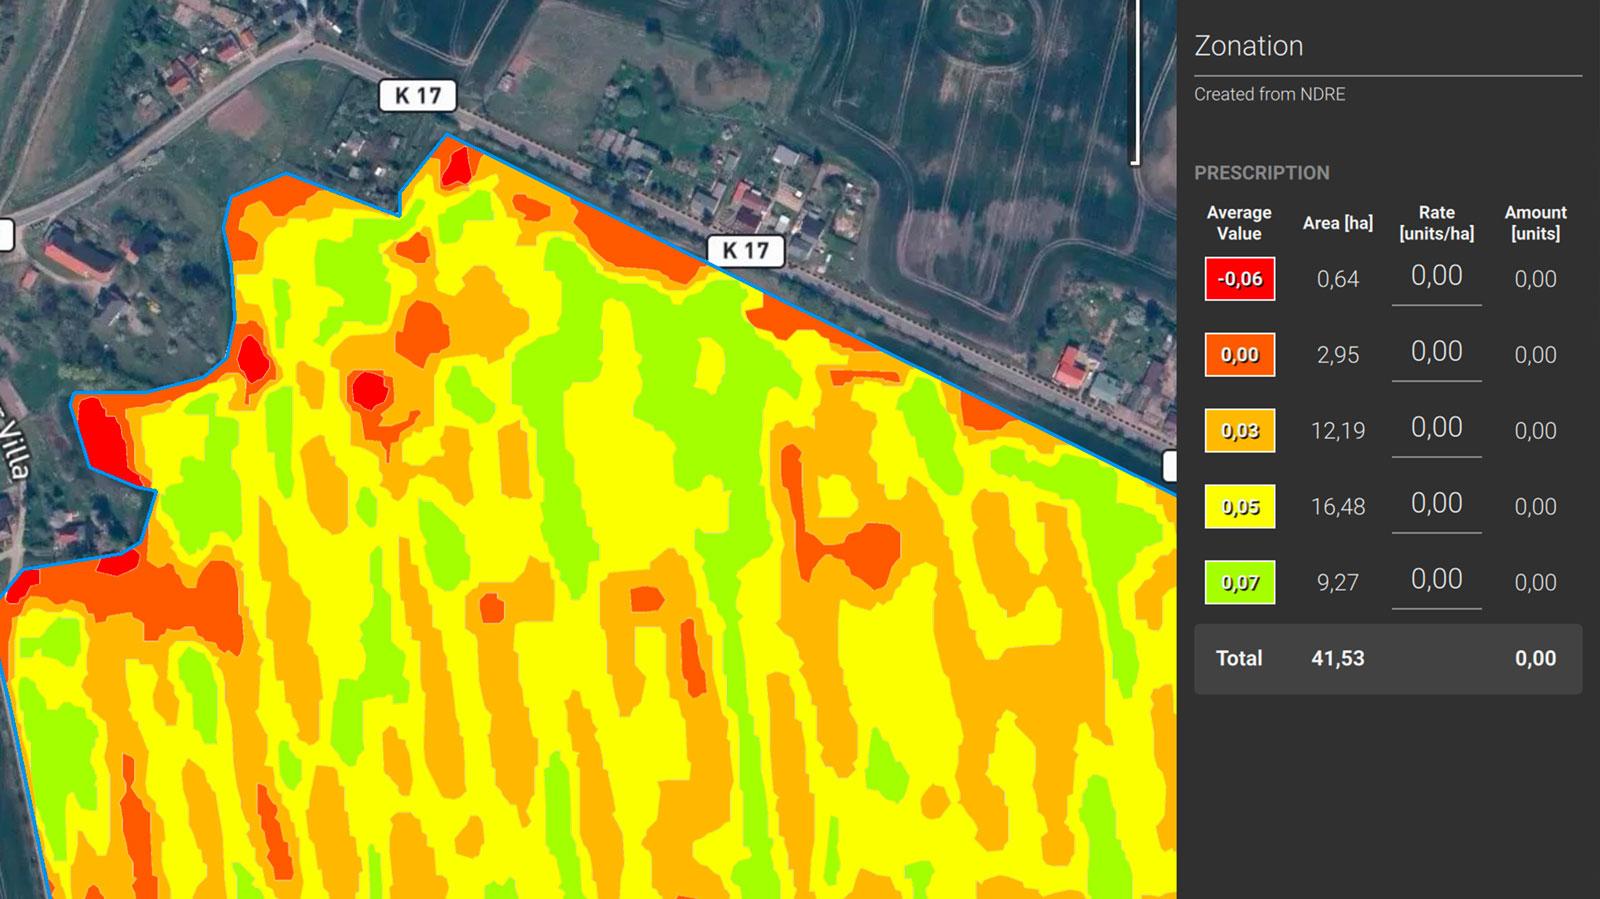 Producción de mapa de prescripción para agricultura de precisión